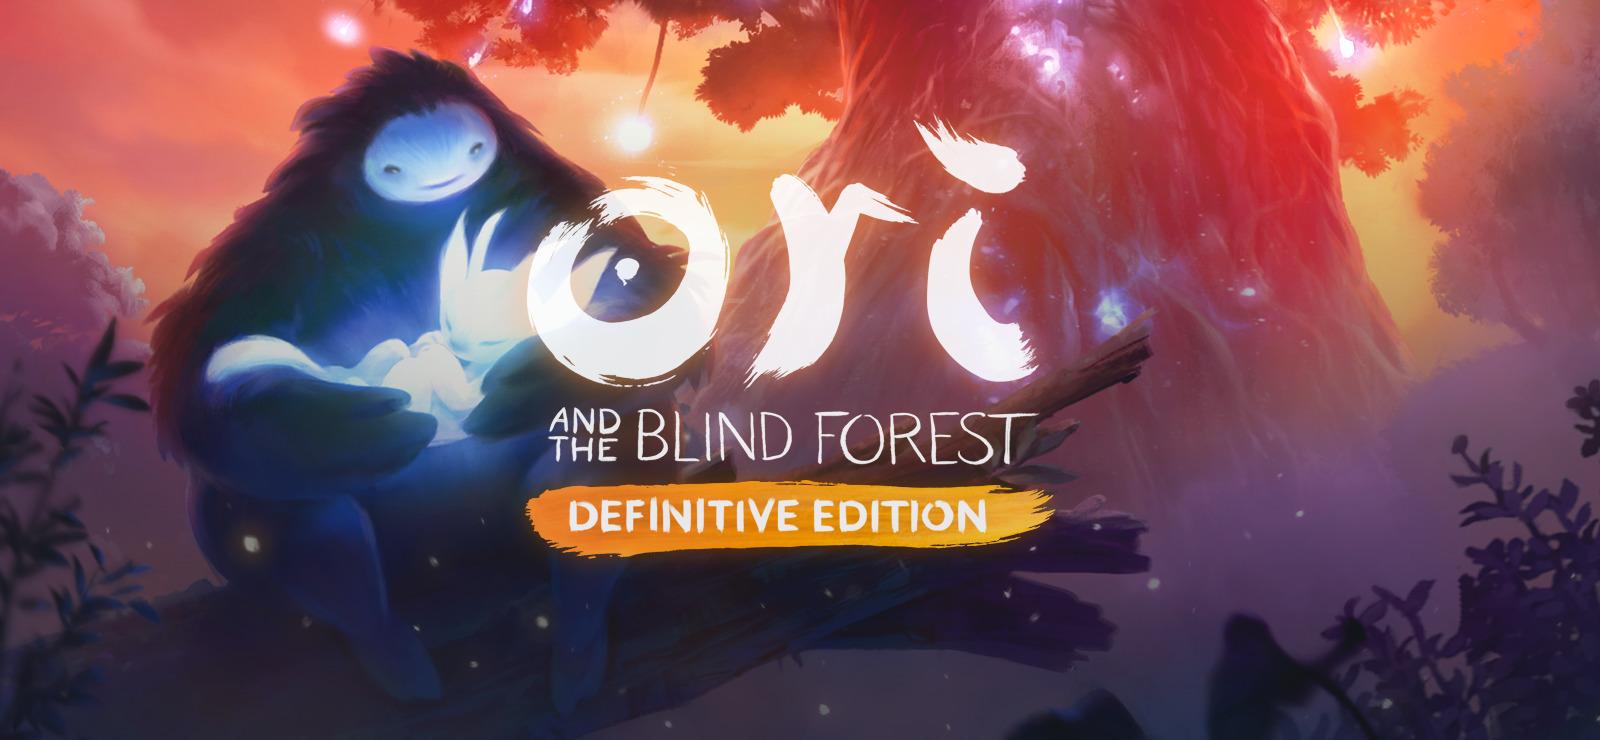 Moon Studios e Xbox Game Studios anunciam Ori and the Blind Forest – Definitive Edition para o Nintendo Switch